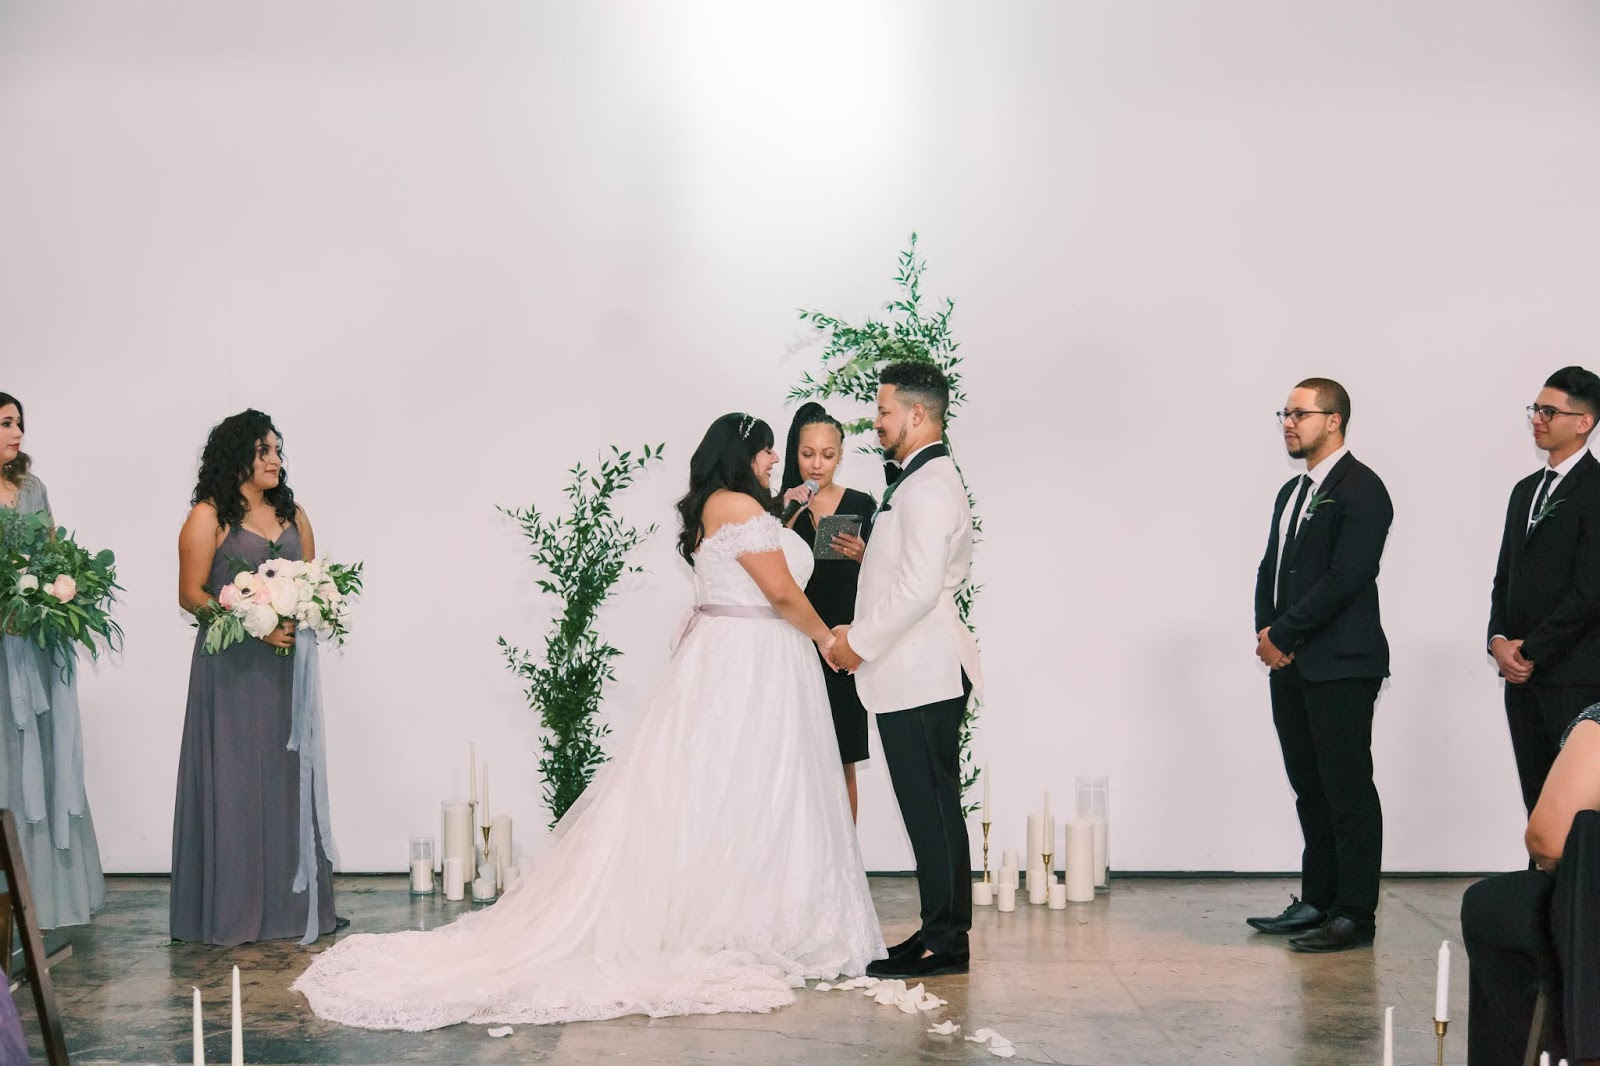 las vegas wedding, altar, tree planting